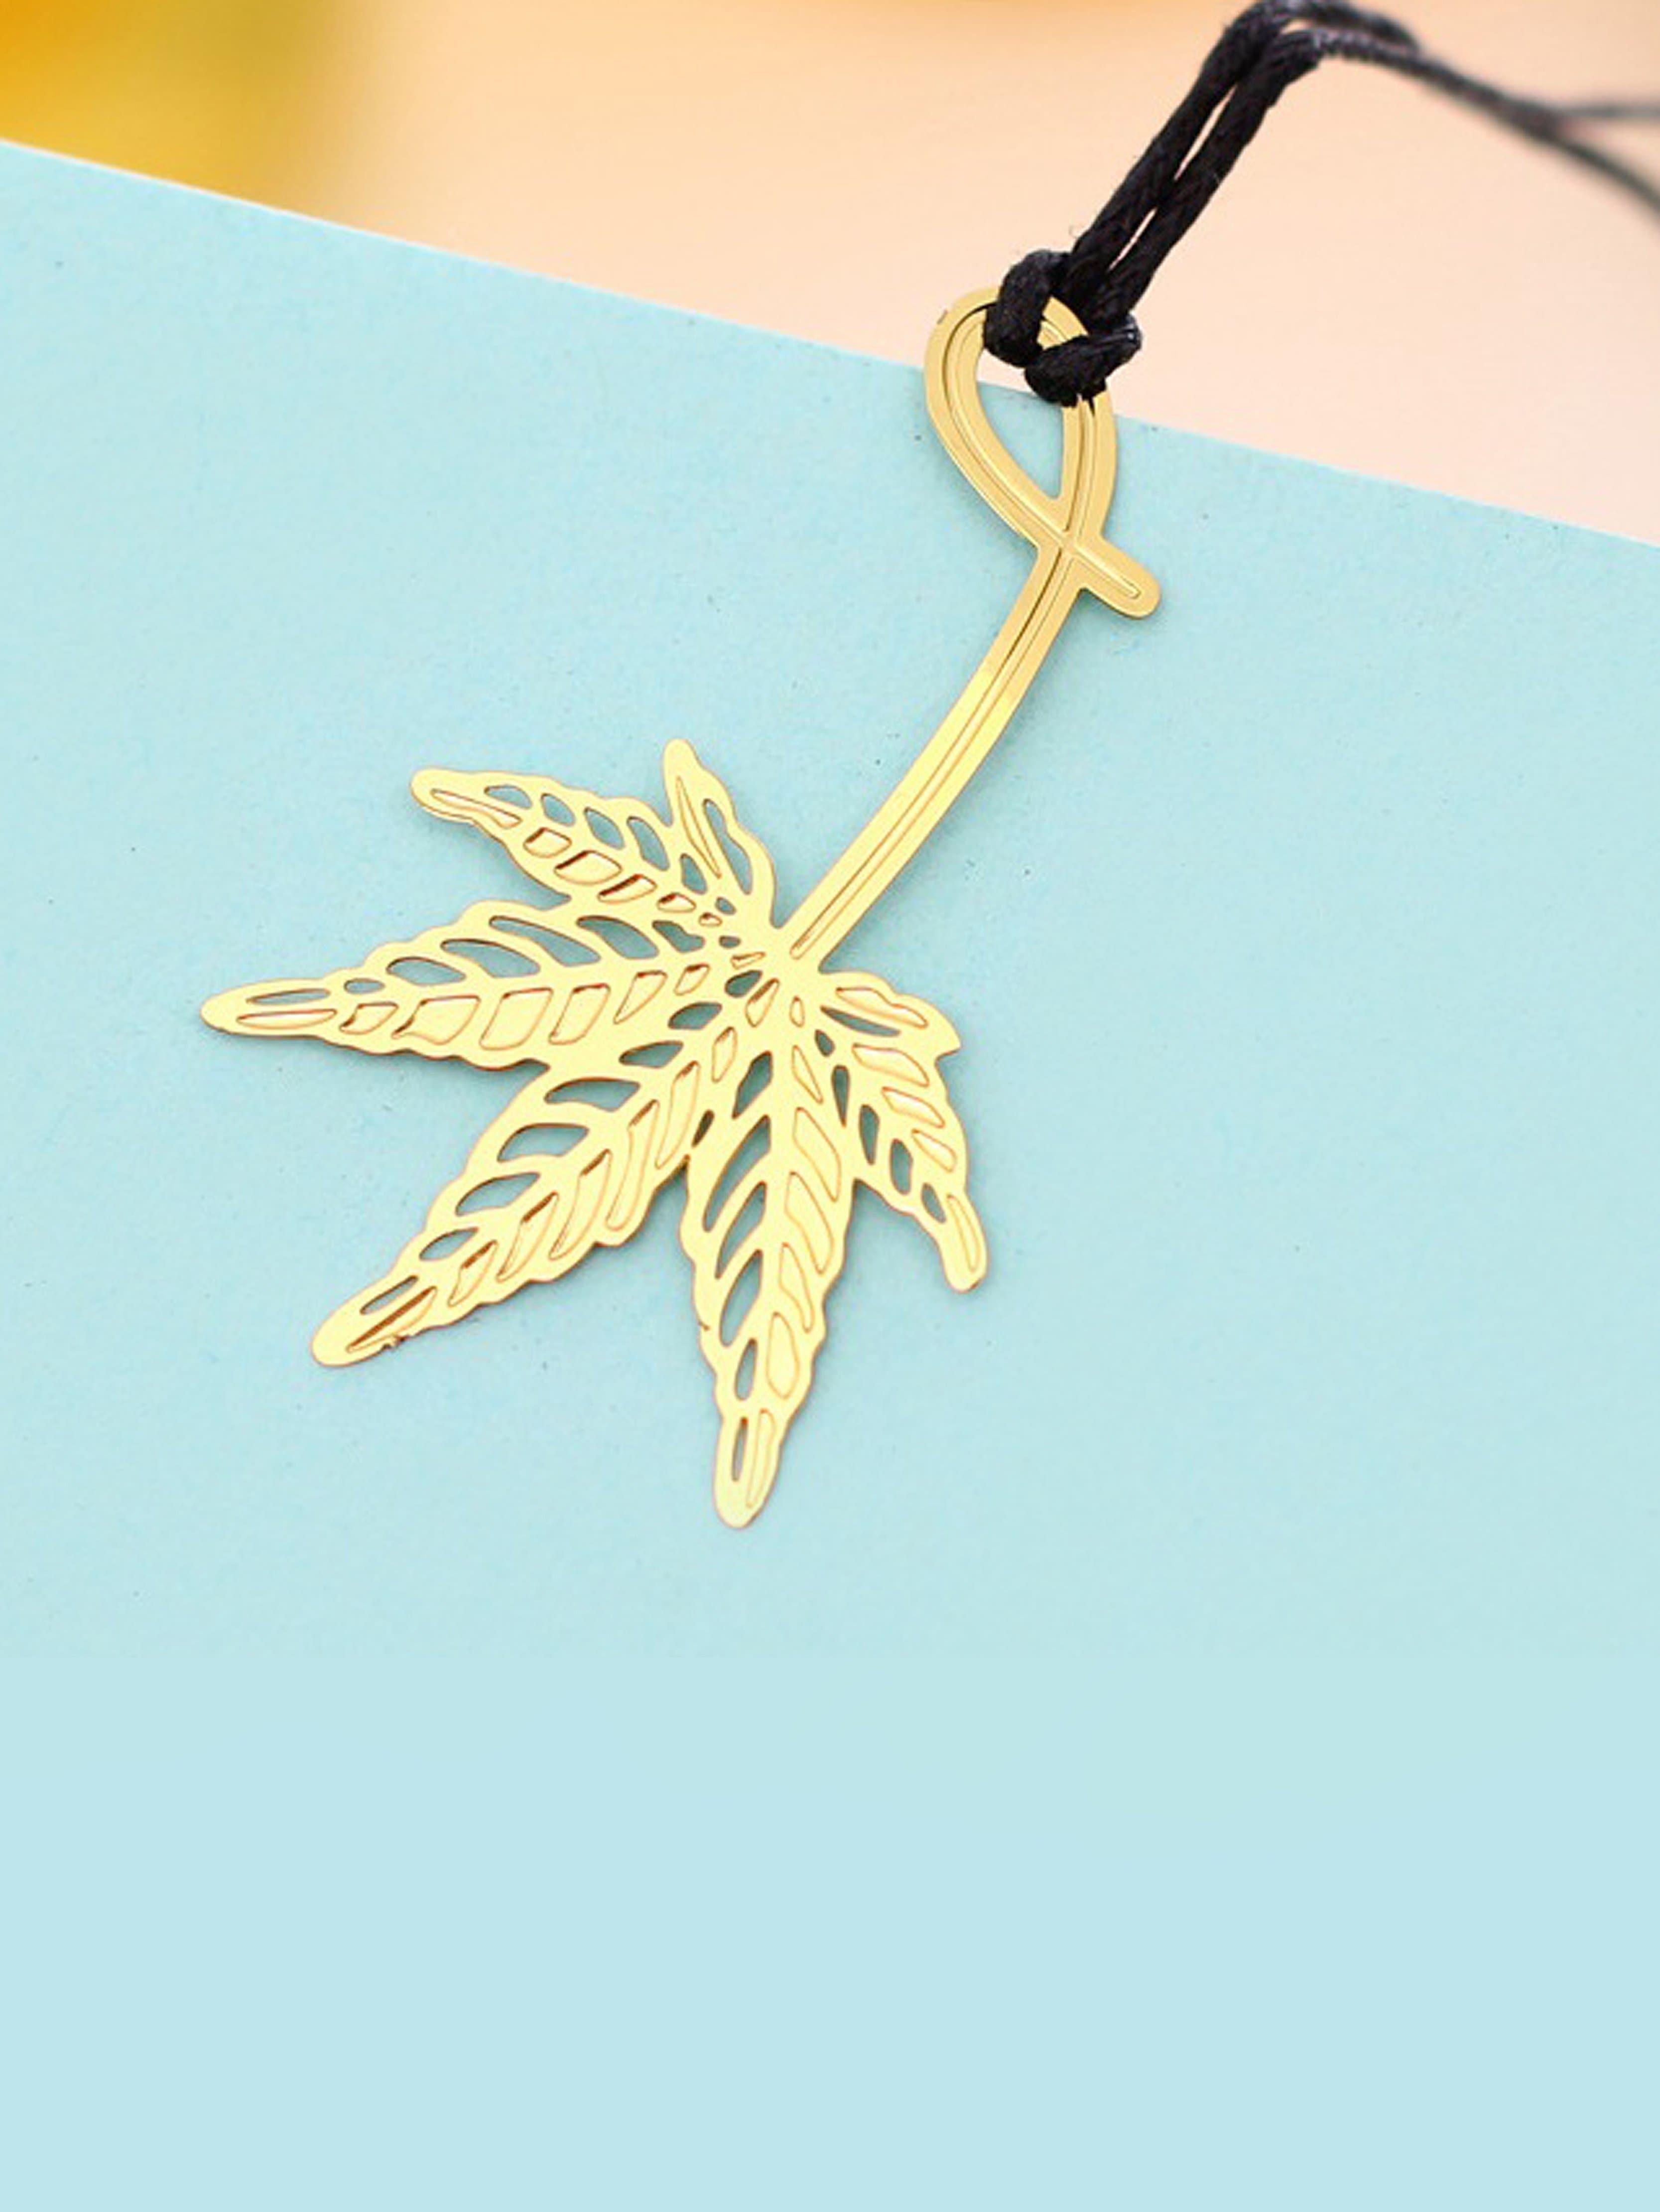 Metal Maple Leaf Book Mark юбка fz1850 maple leaf 2014